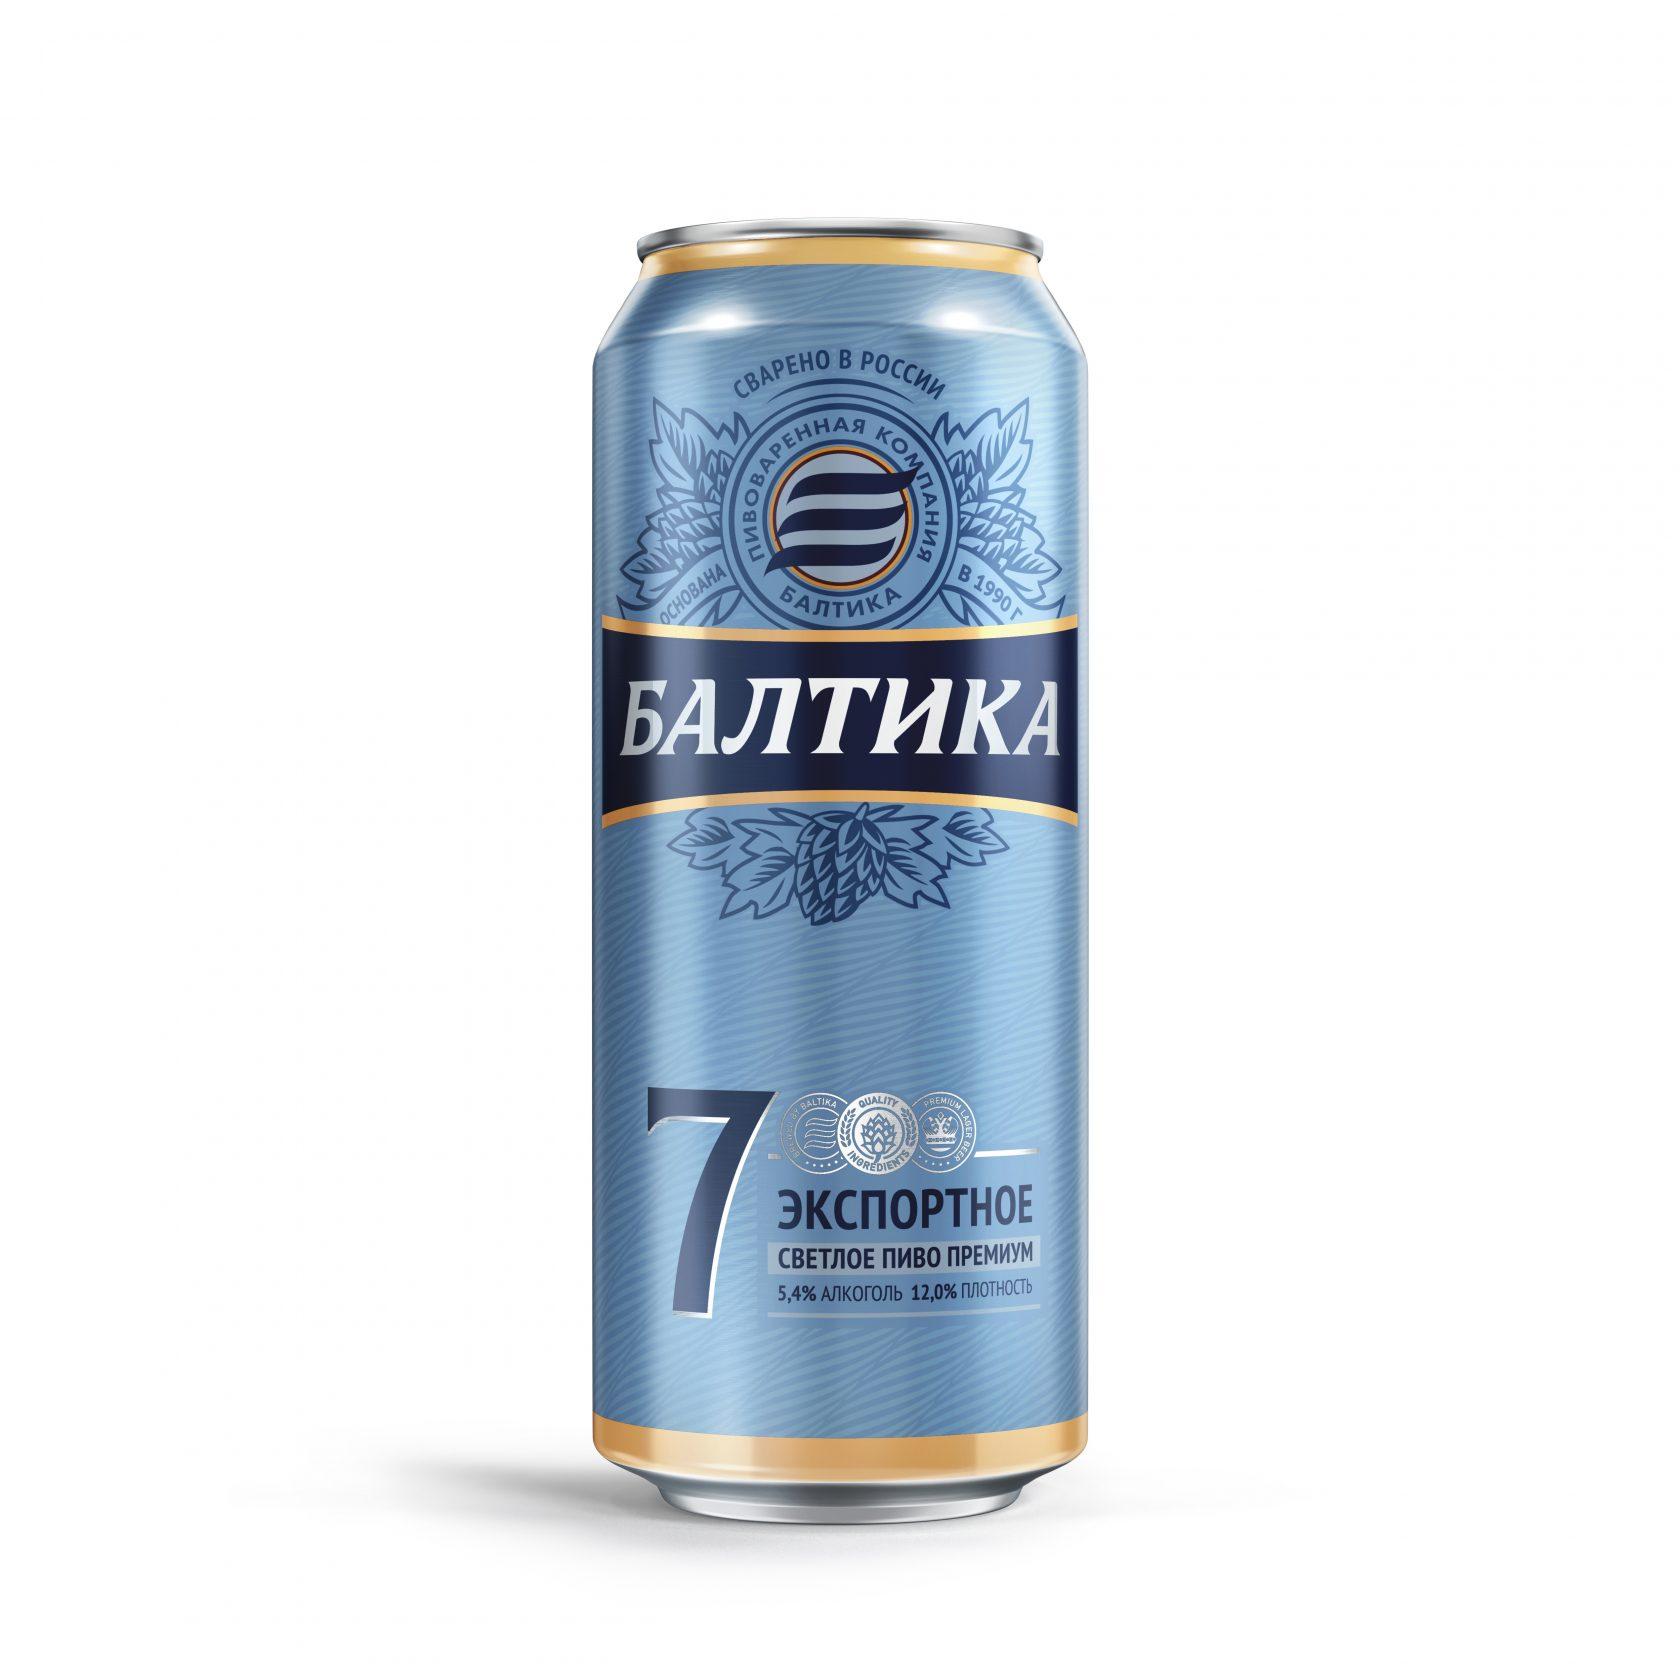 Пиво «Балтика» 7 премиум 0,45л ж/б